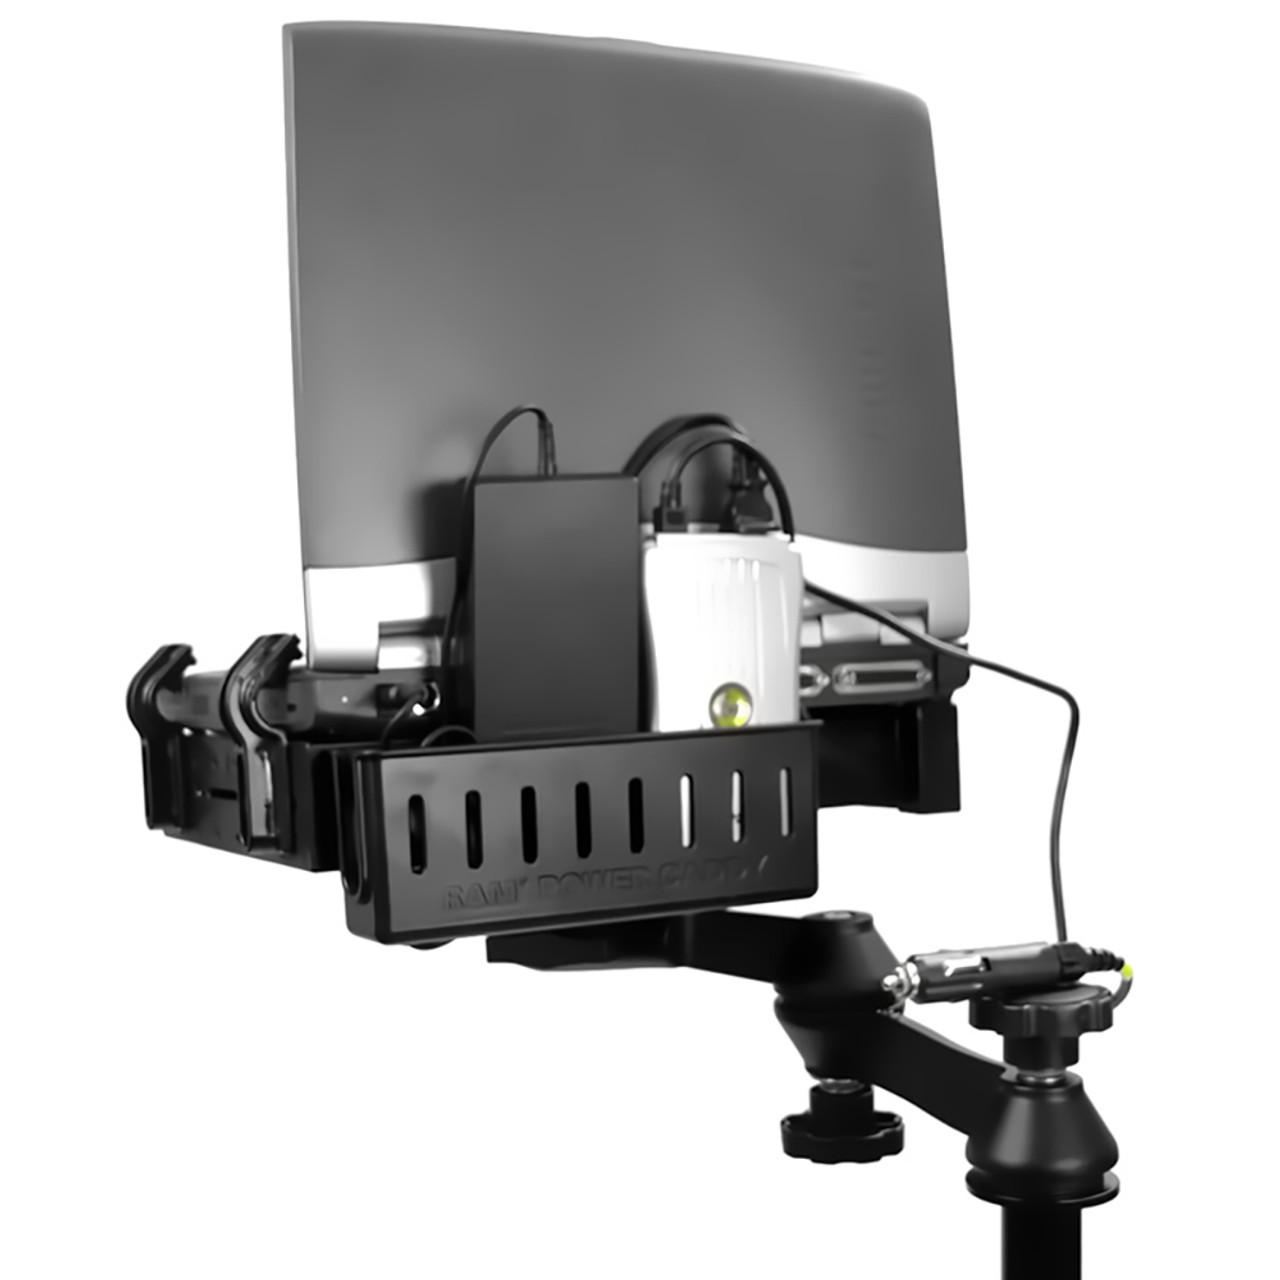 RAM Mount Laptop Power Supply Caddy [RAM-234-5U]